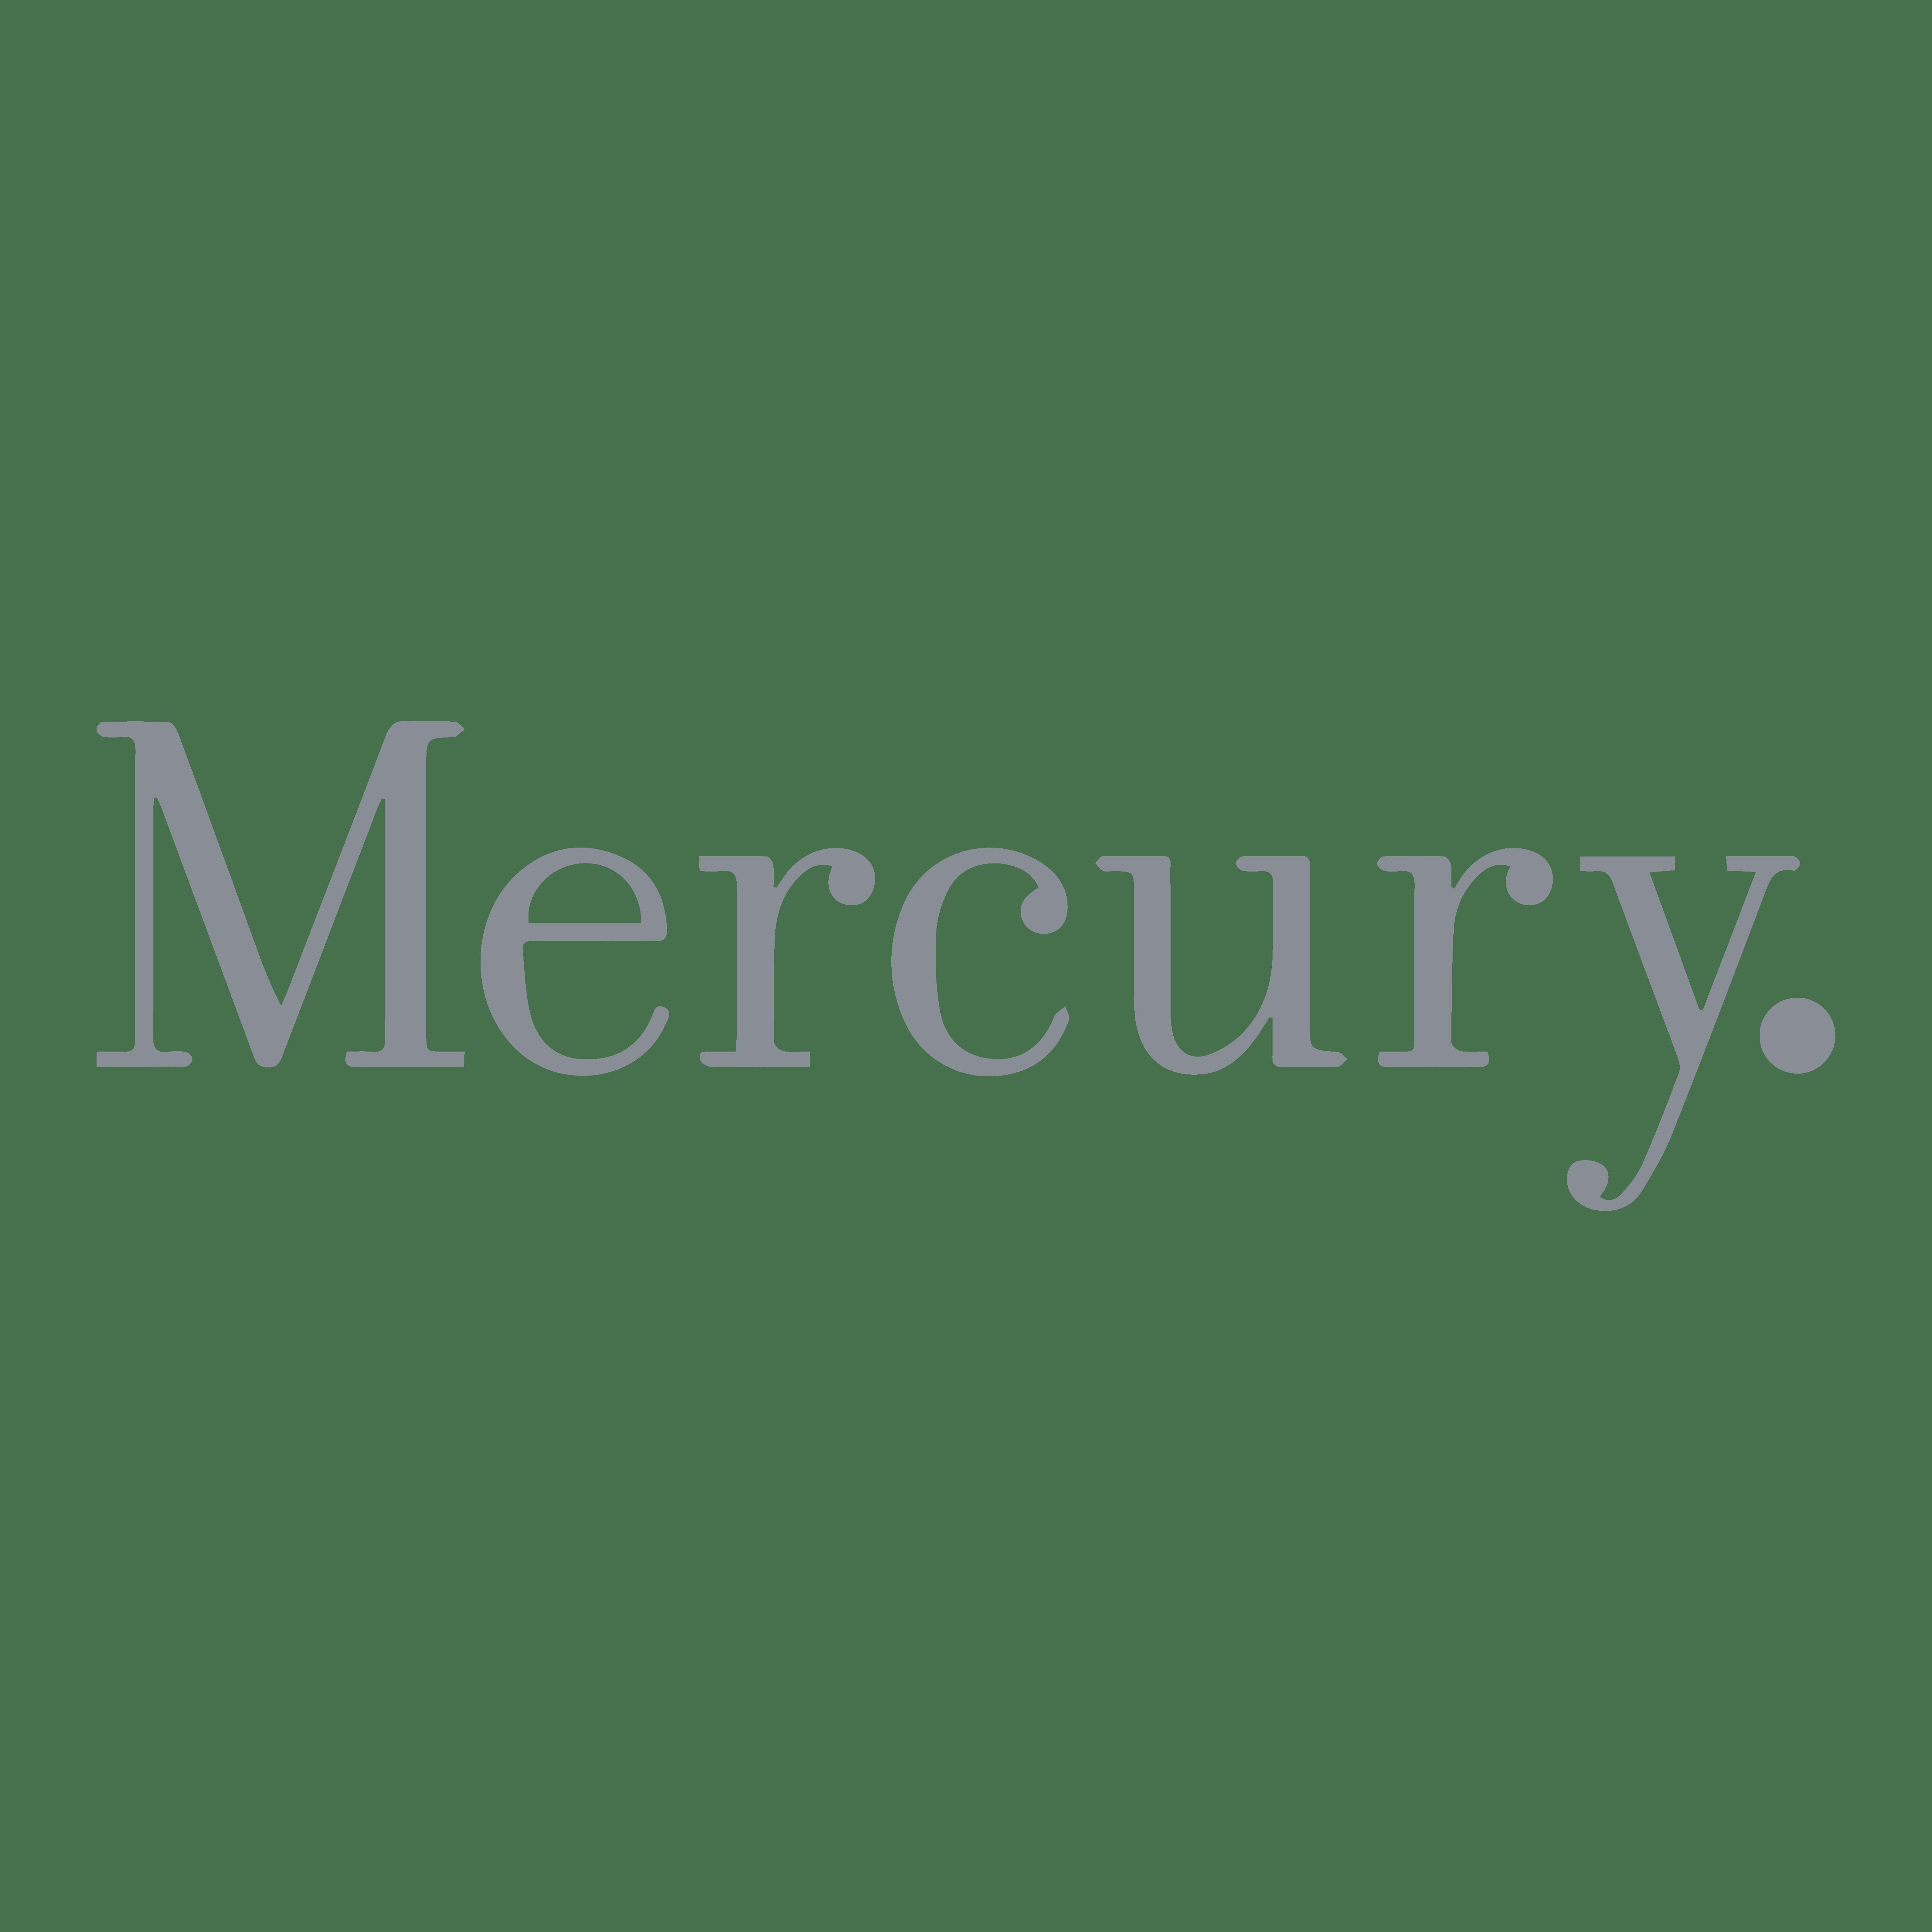 Mercury-agency